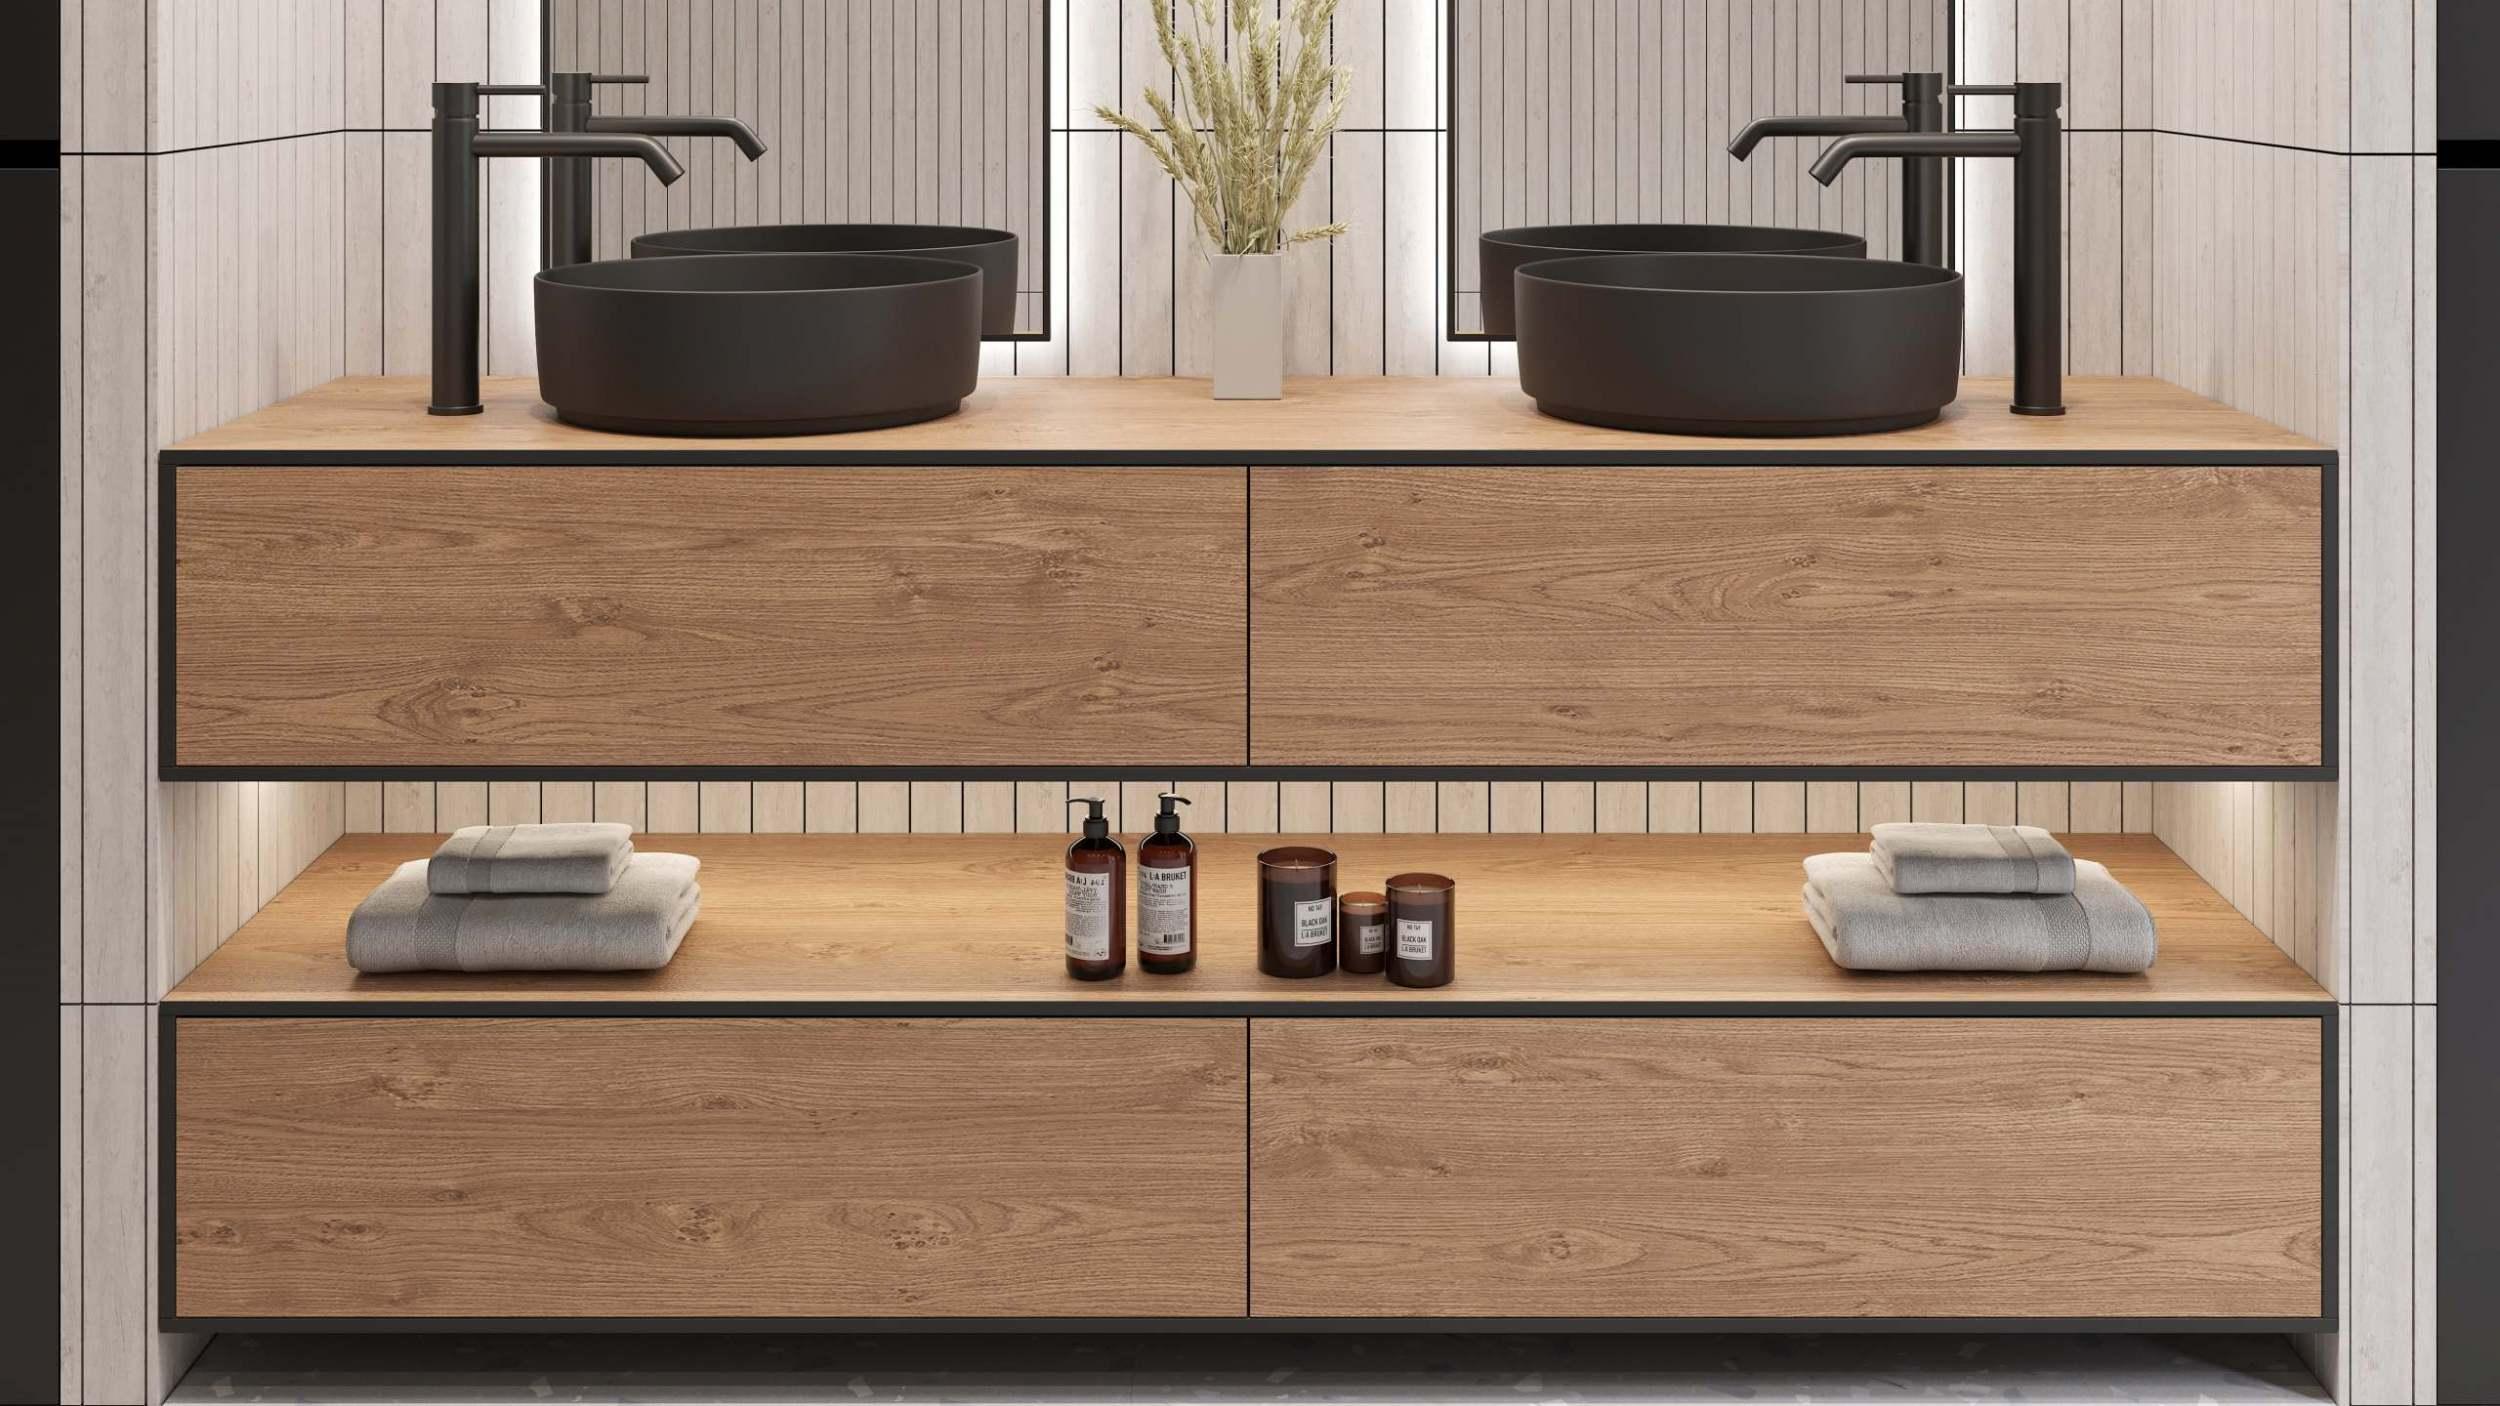 kitchen_studio_bathroom_lignum_2